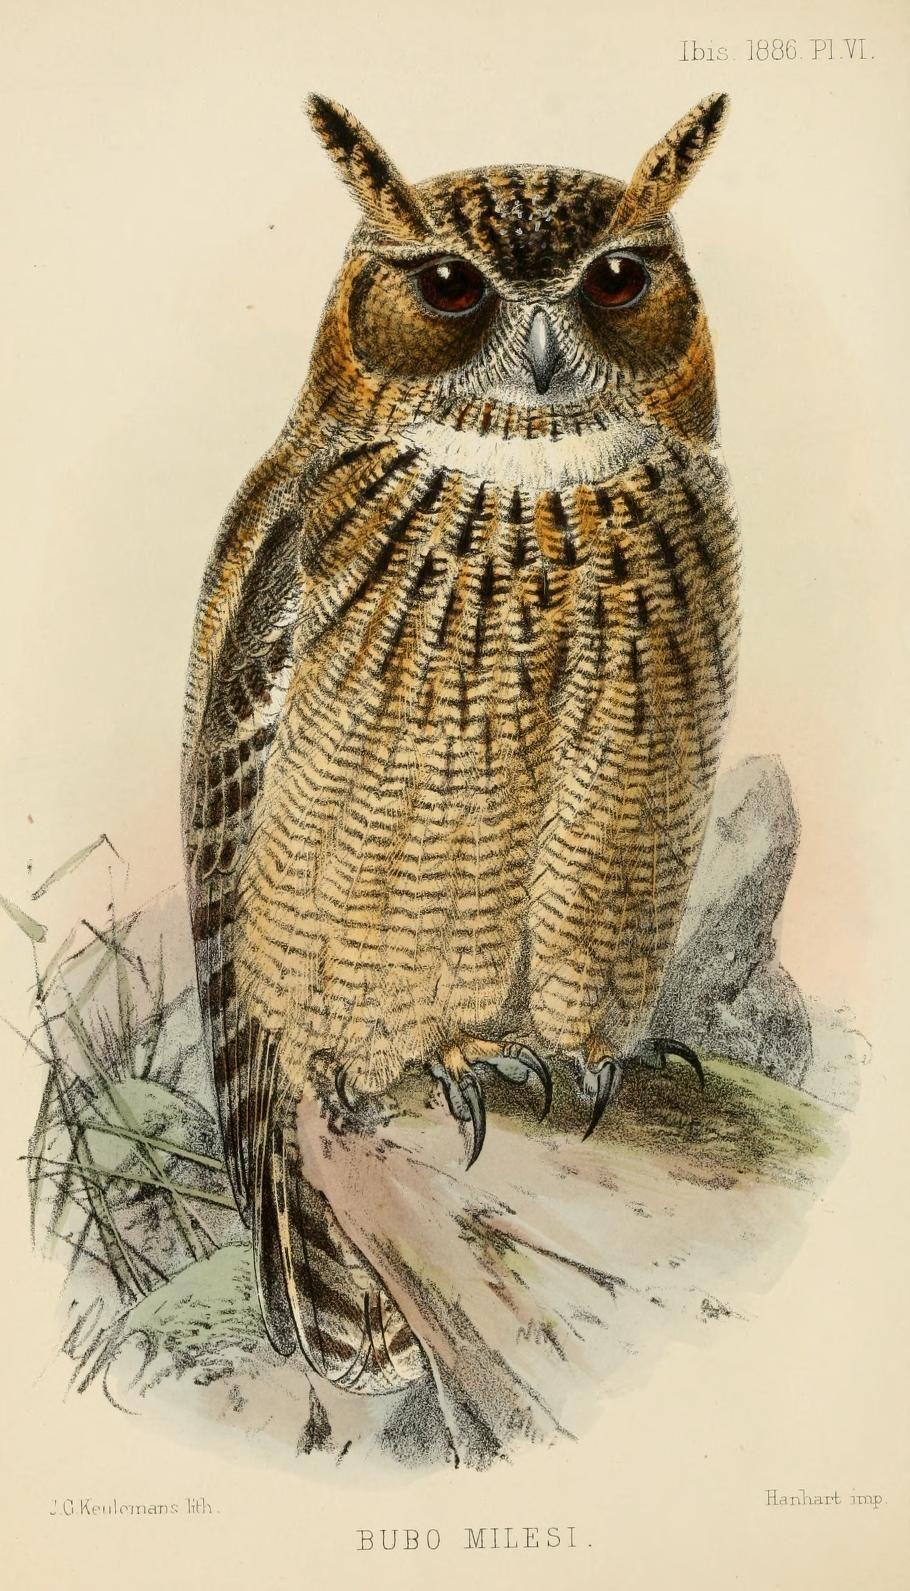 Ser 5 V 4 1886 Ibis Biodiversity Heritage Library Owl Art Print Wildlife Prints Vintage Bird Illustration